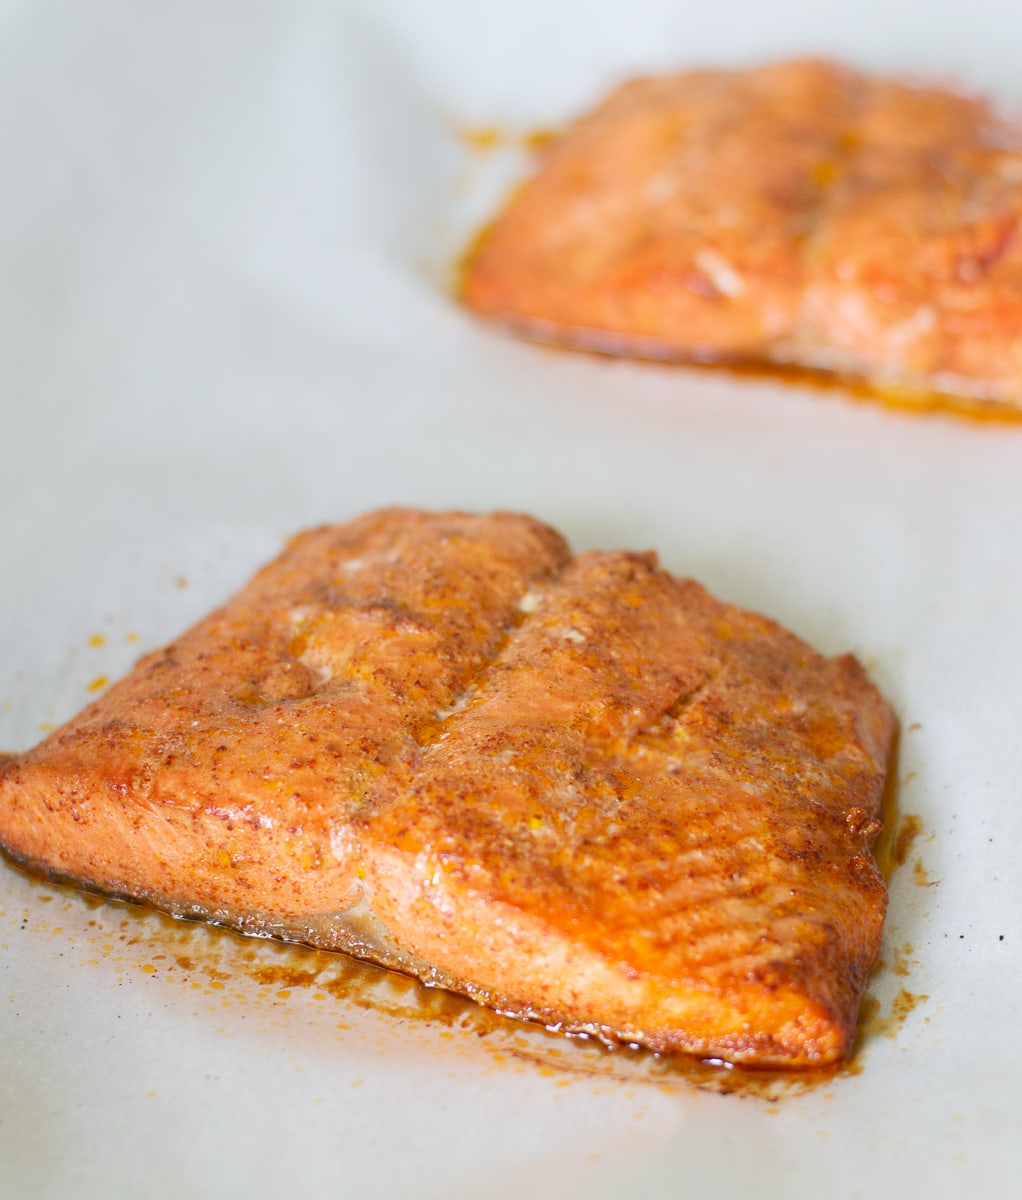 Chipotle Lime Salmon with Mango Avocado Salsa - Paleo, Whole 30 - Fixed on Fresh